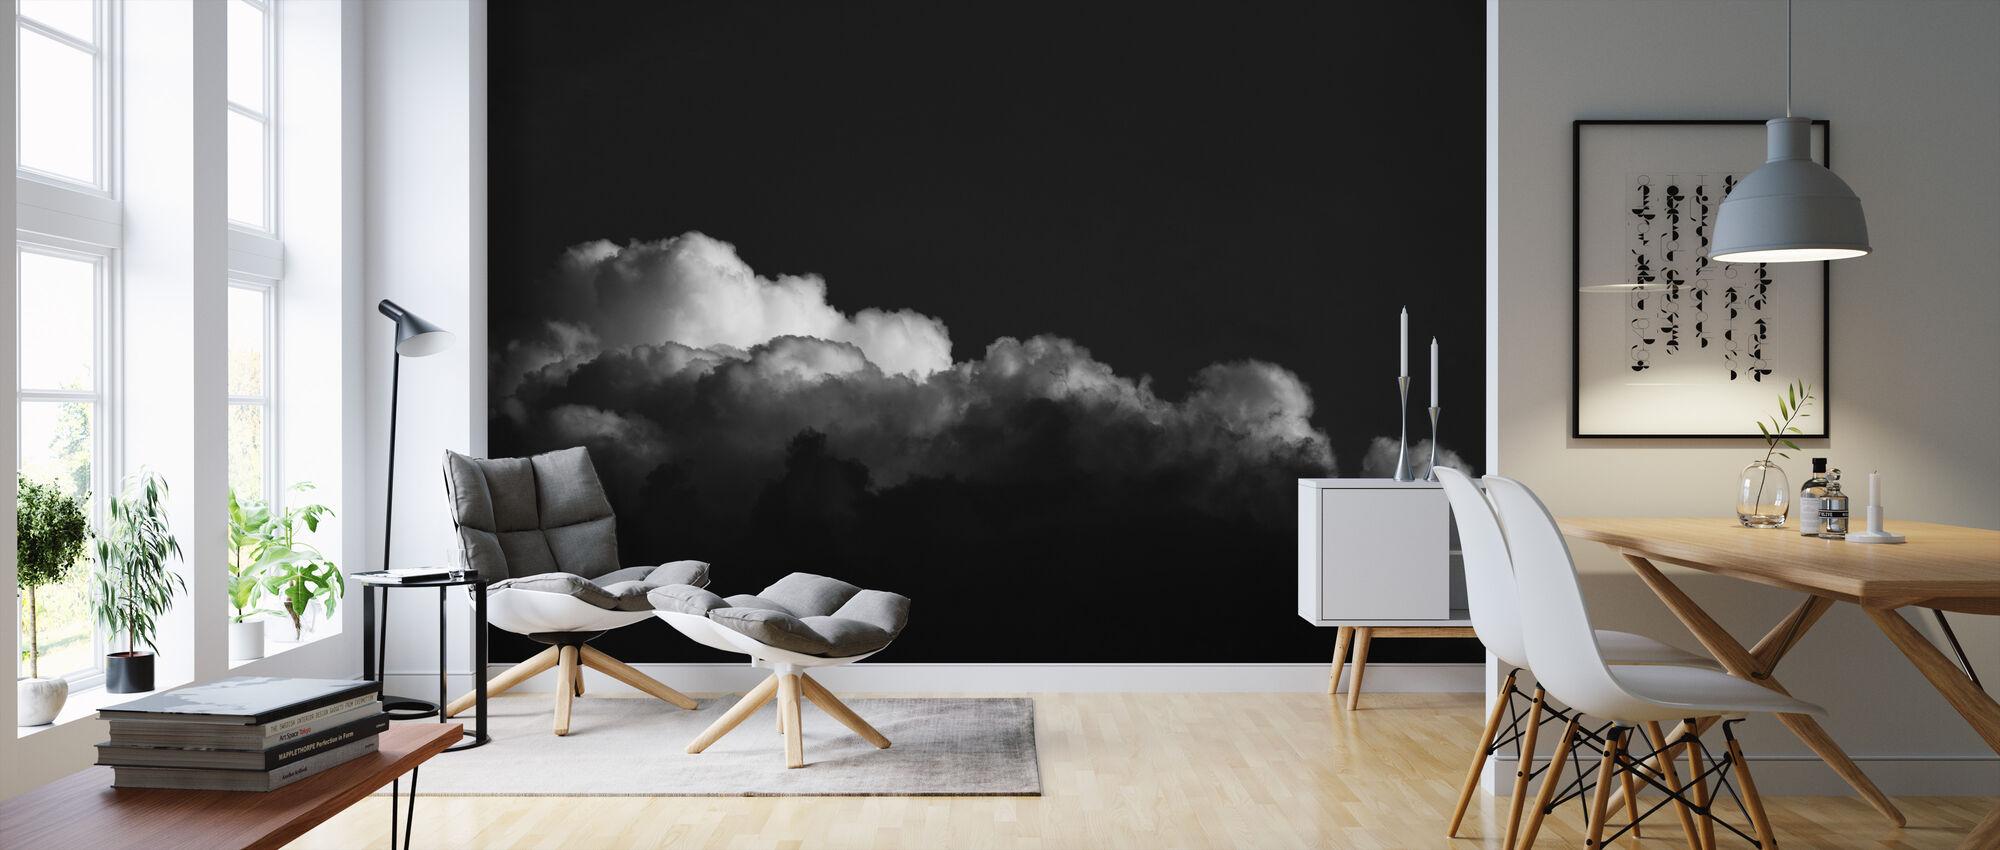 Gradient Cloud BW - Wallpaper - Living Room